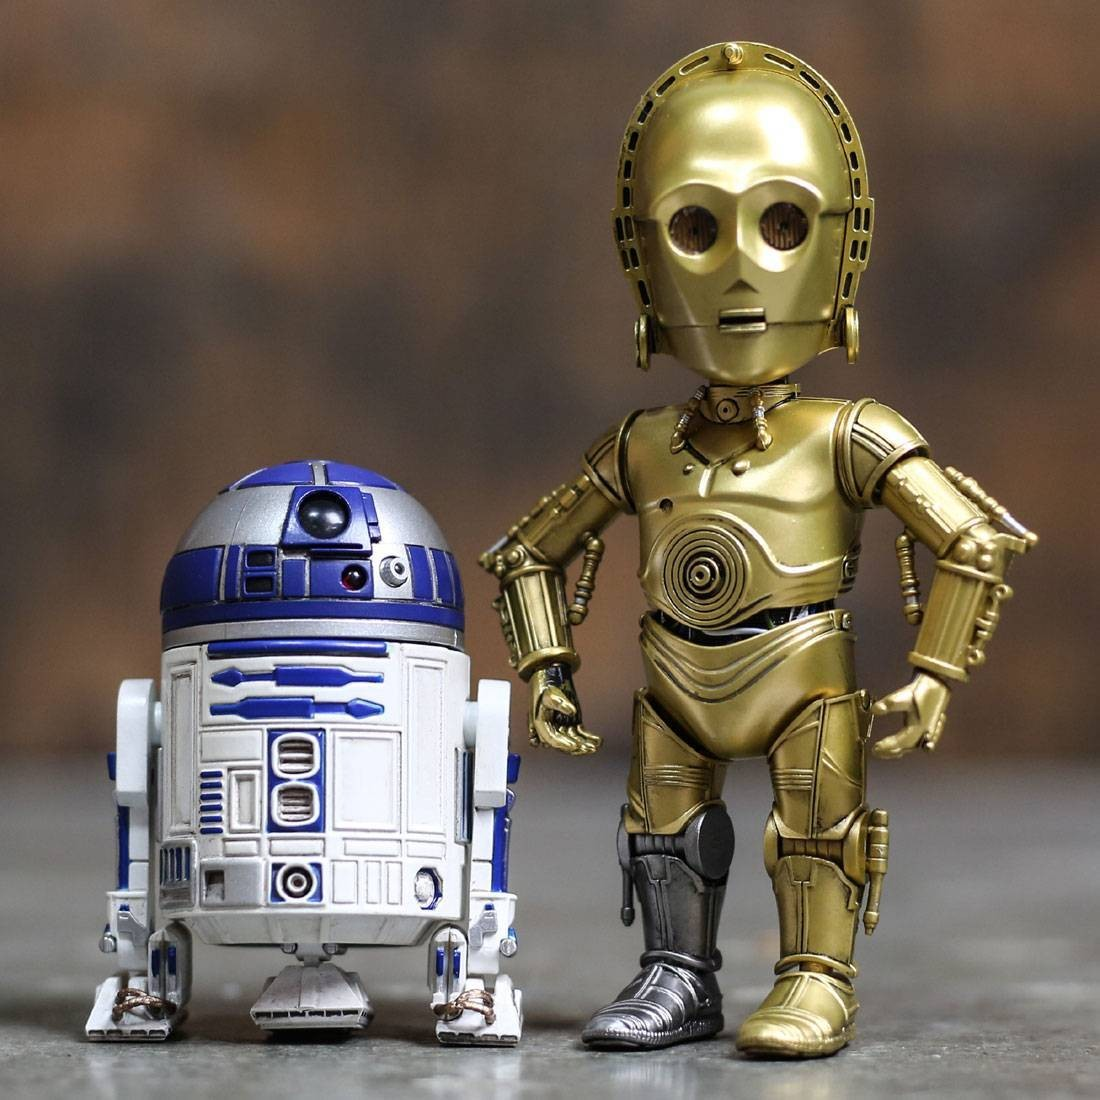 Herocross Hybrid Metal Figuration #024 Star Wars R2-D2 And C-3PO Diecast Figure Set (blue / gold)